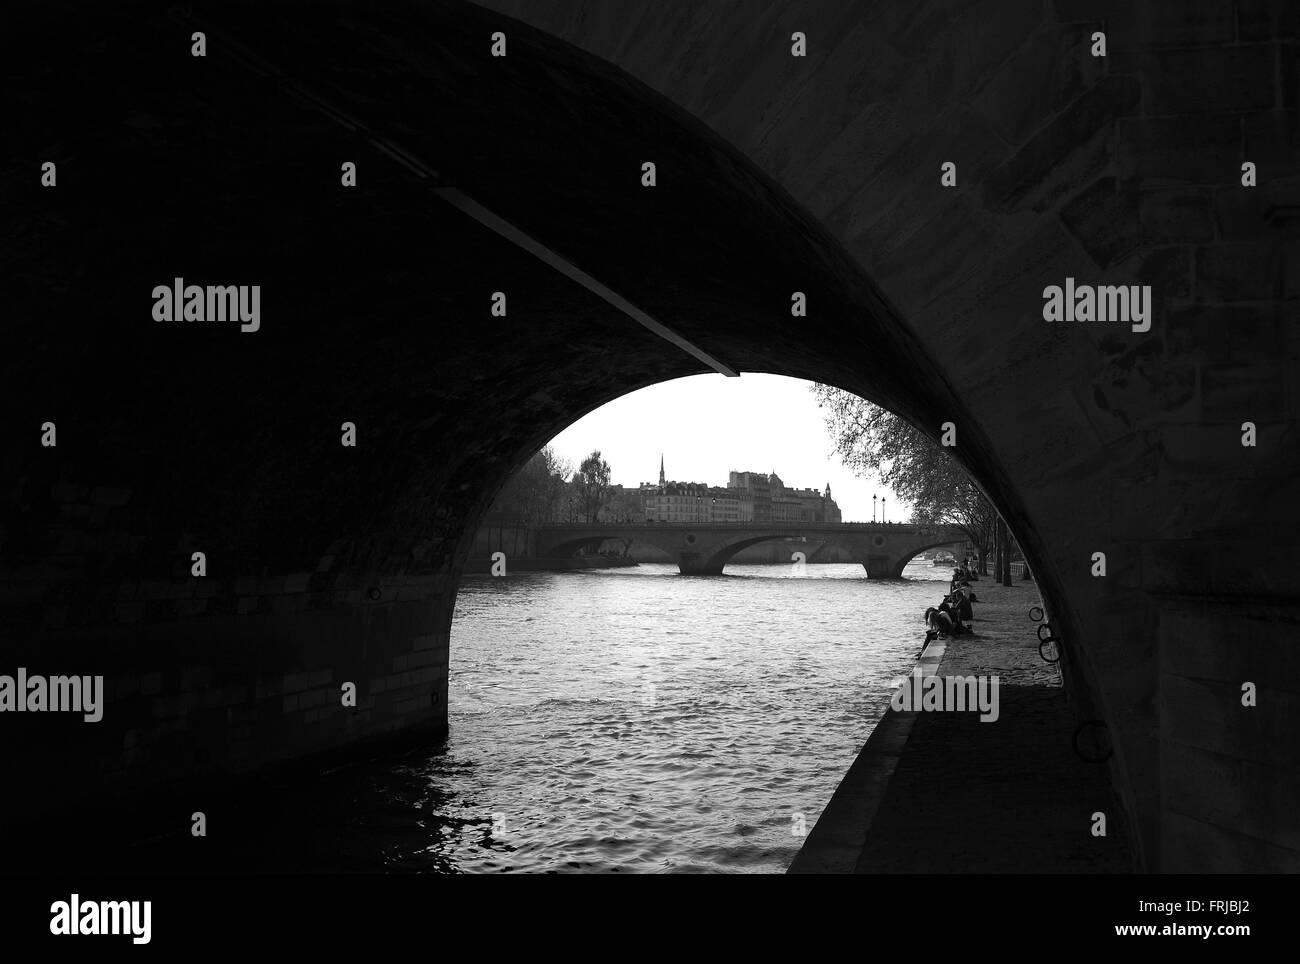 Quai des Celestins from Pont Marie - Stock Image